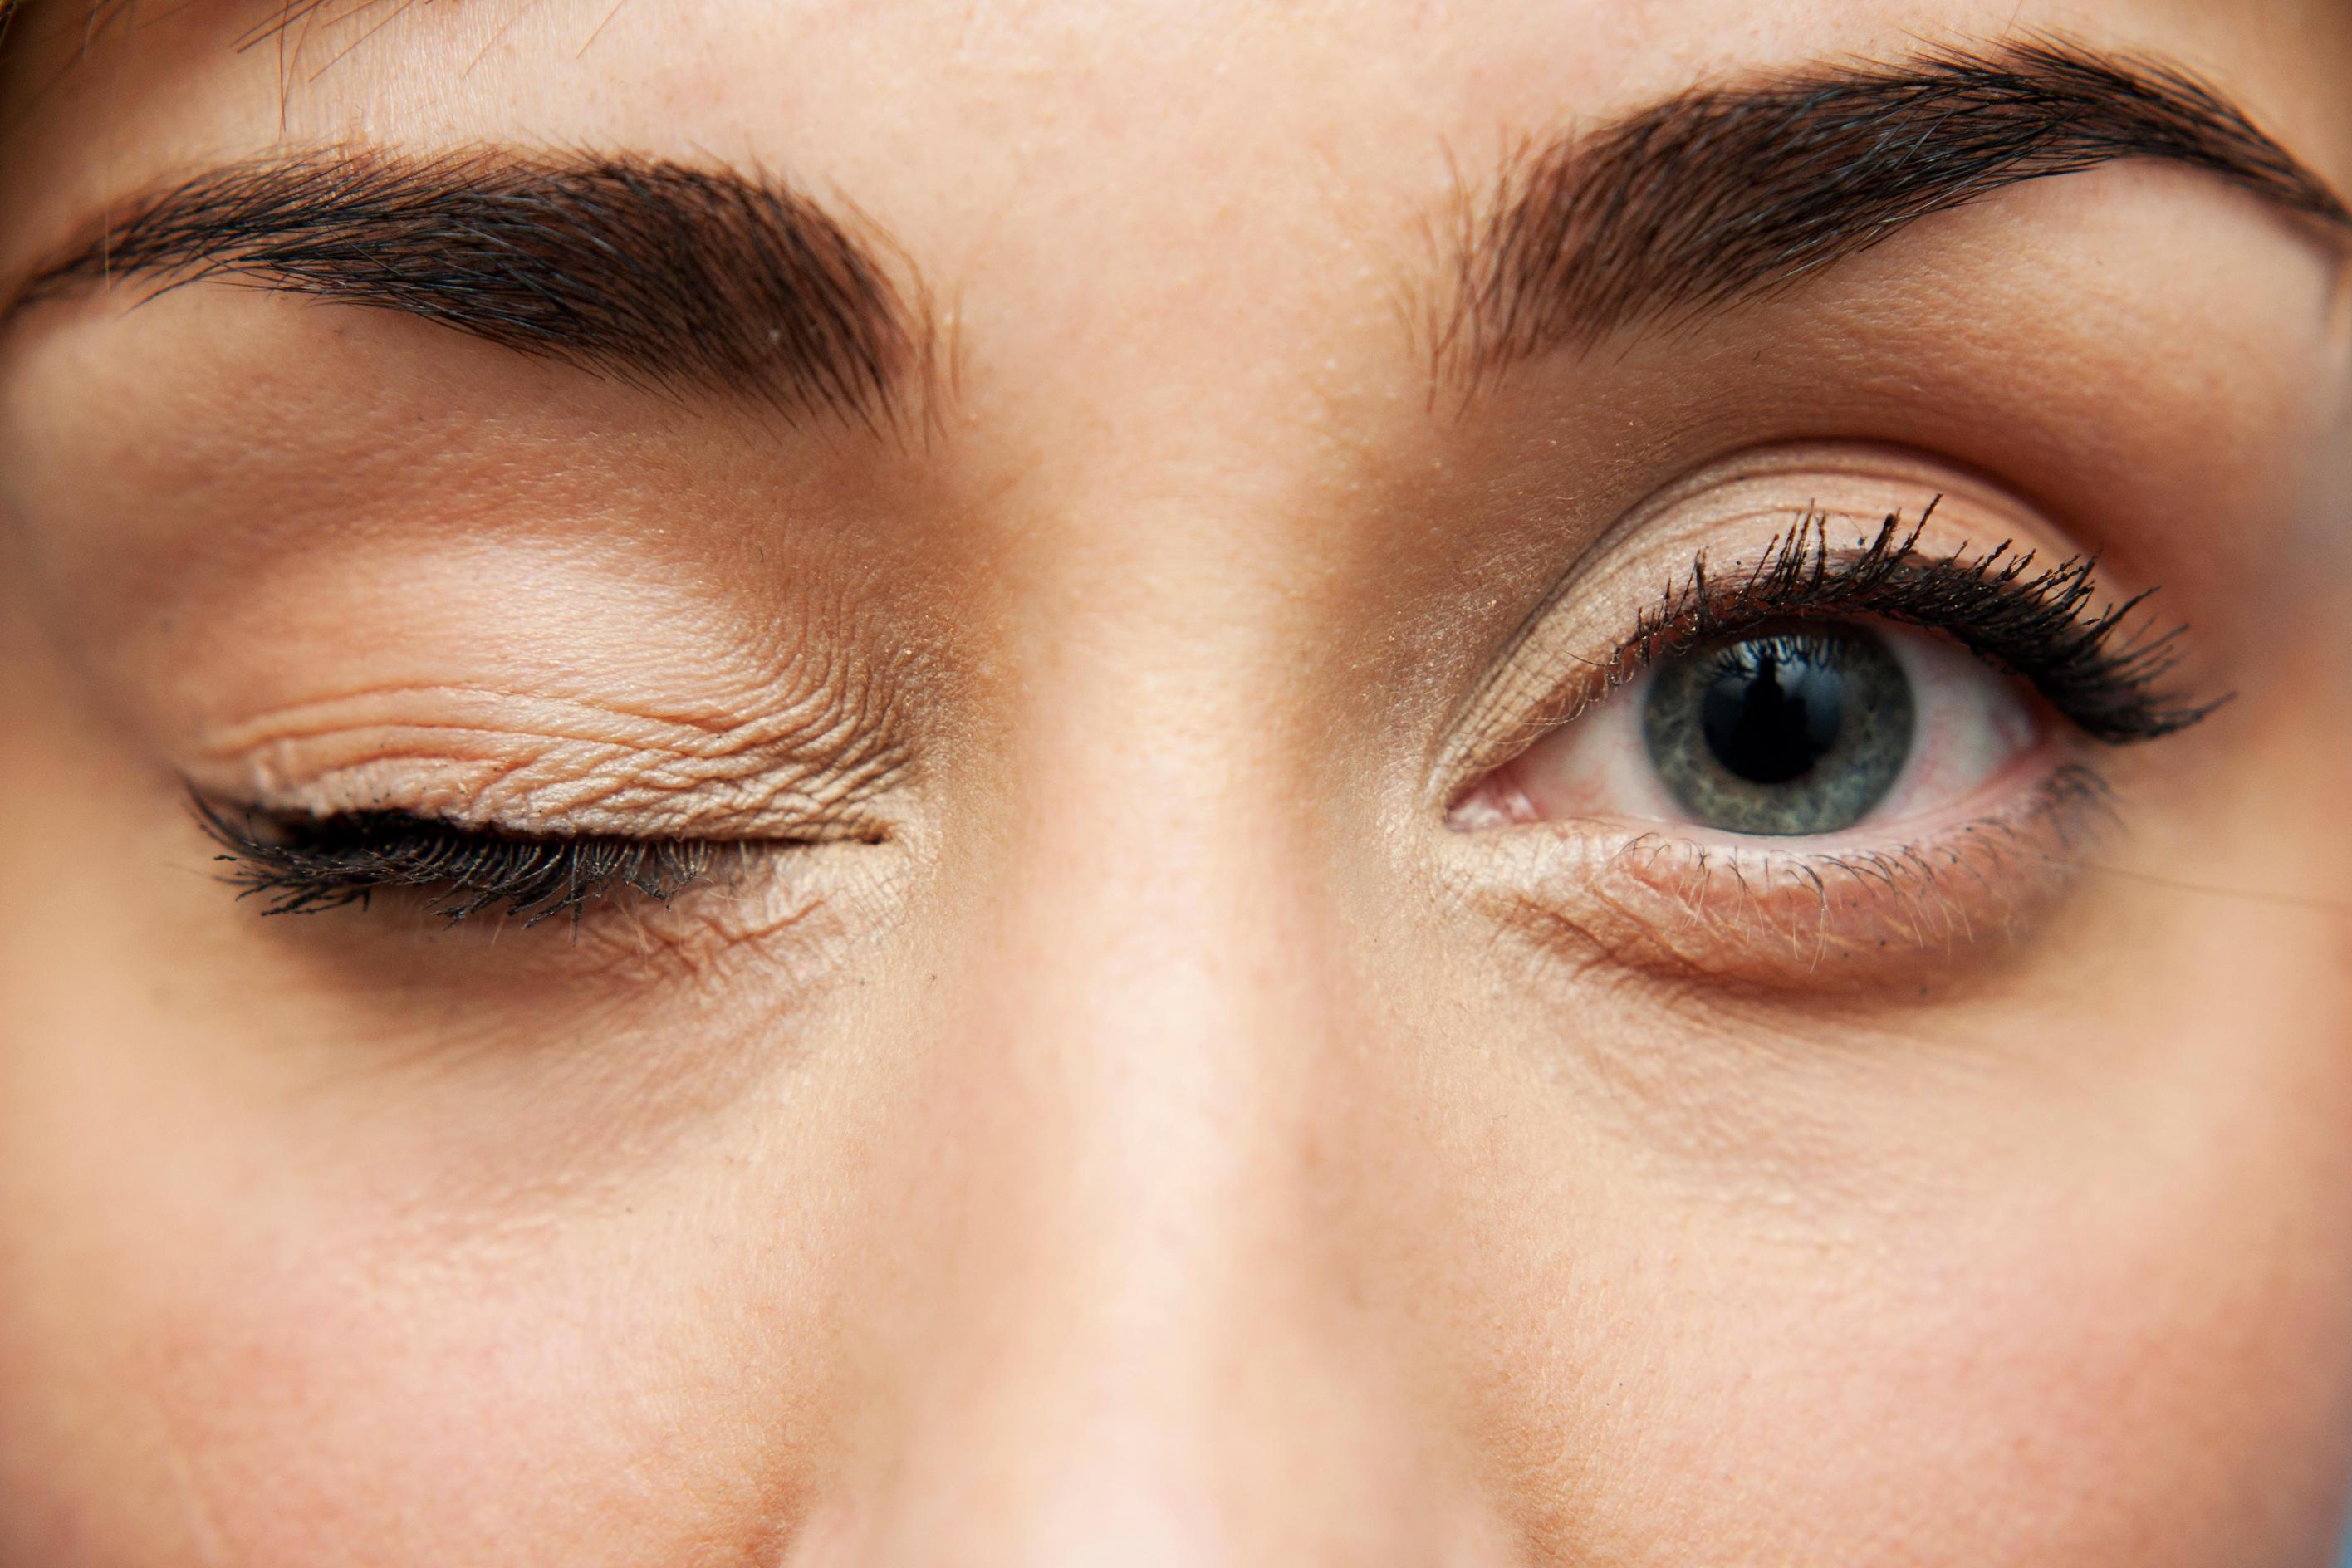 PunjabKesari, दाईं आंख का फड़कना, Right eye